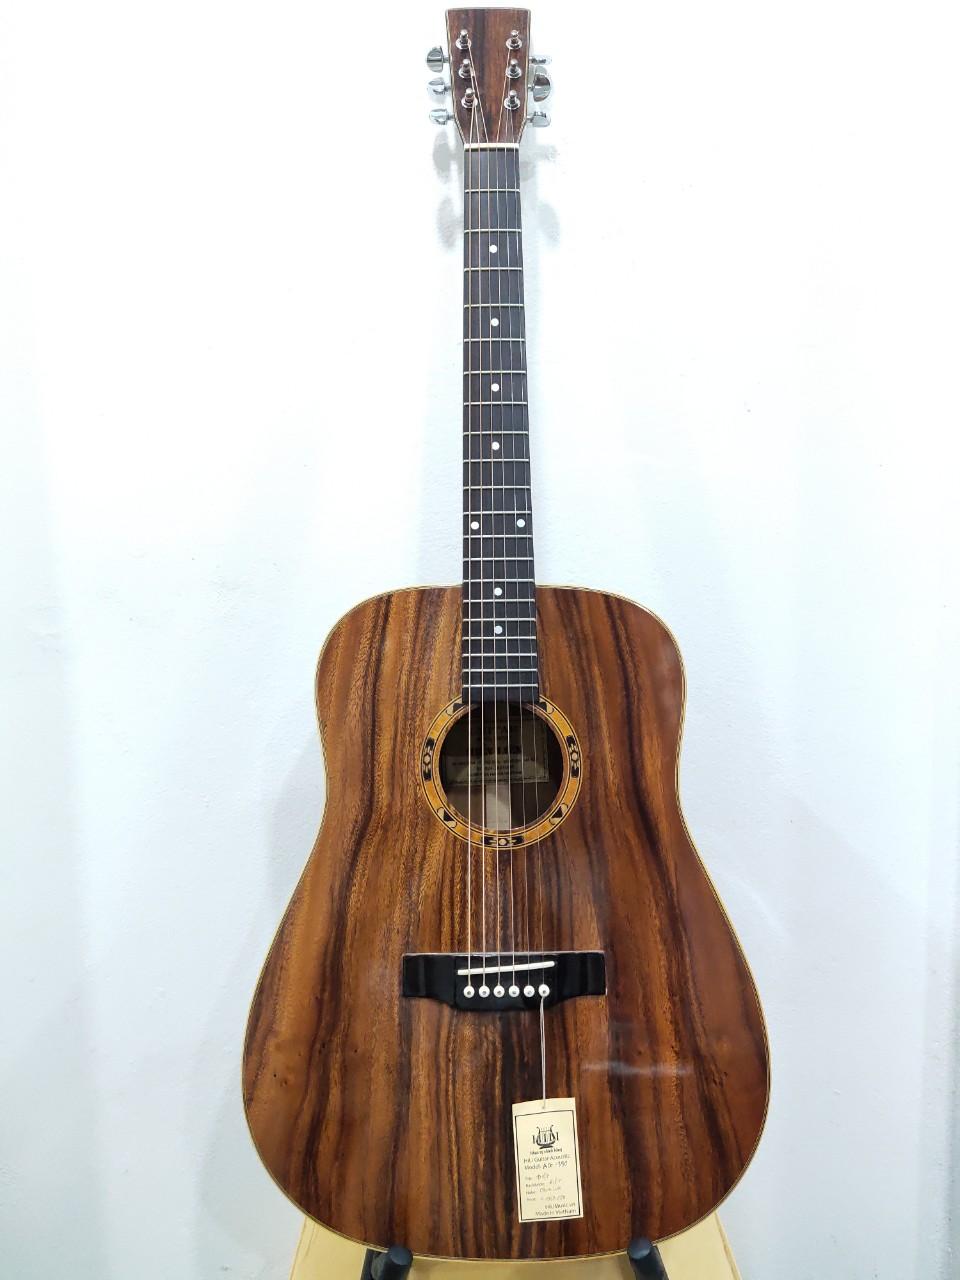 Đàn Guitar Acoustic AG-390A Full Điệp Made in VietNam